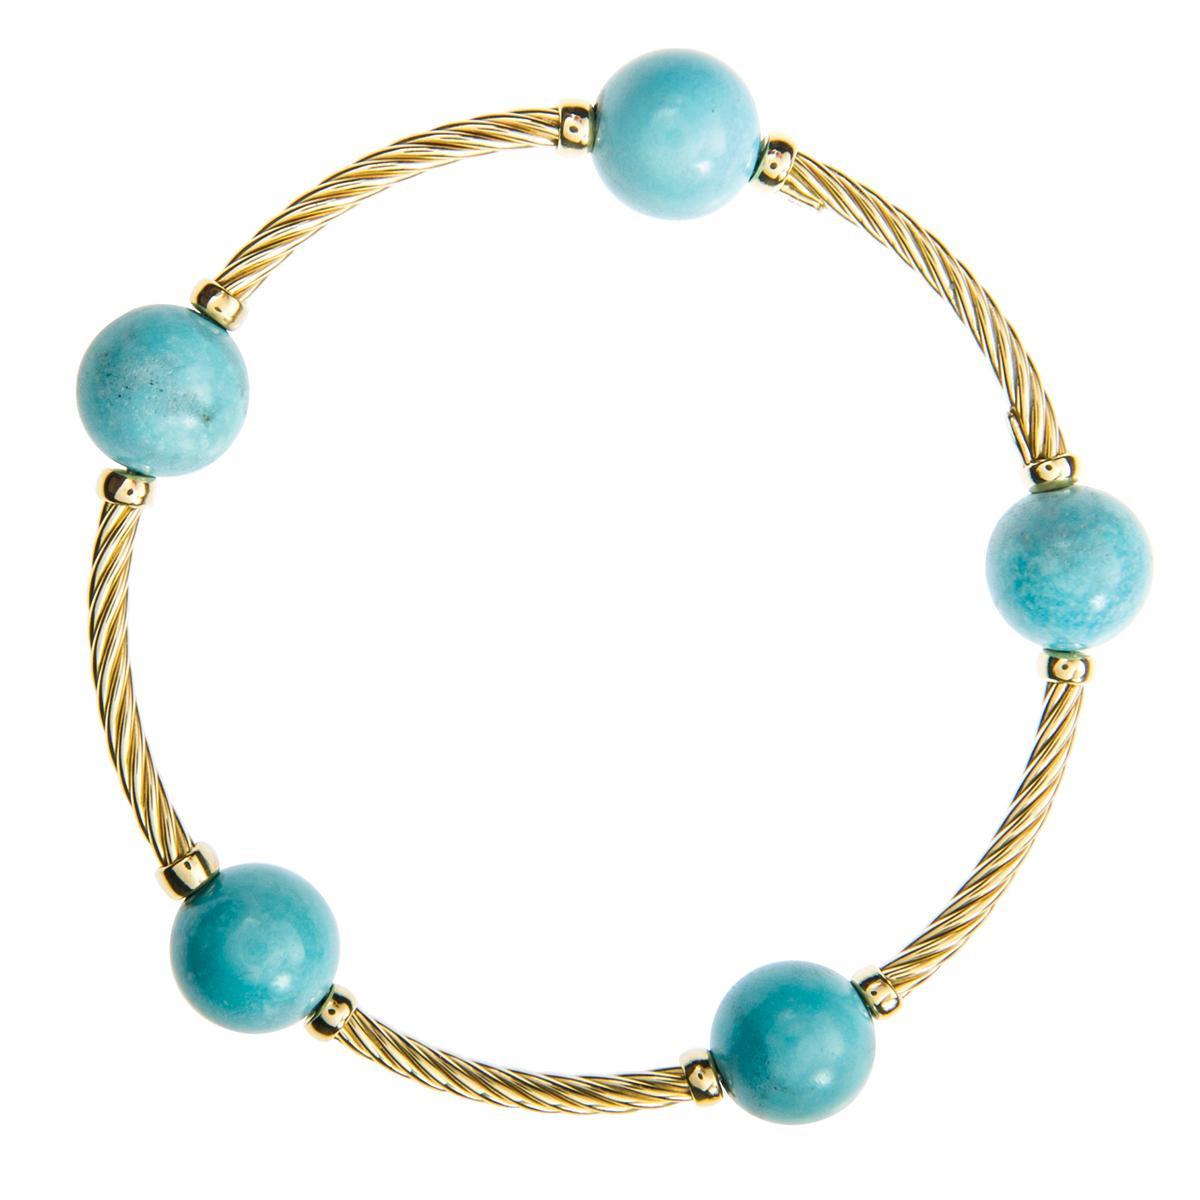 Vintage David Yurman Turquoise Bangle